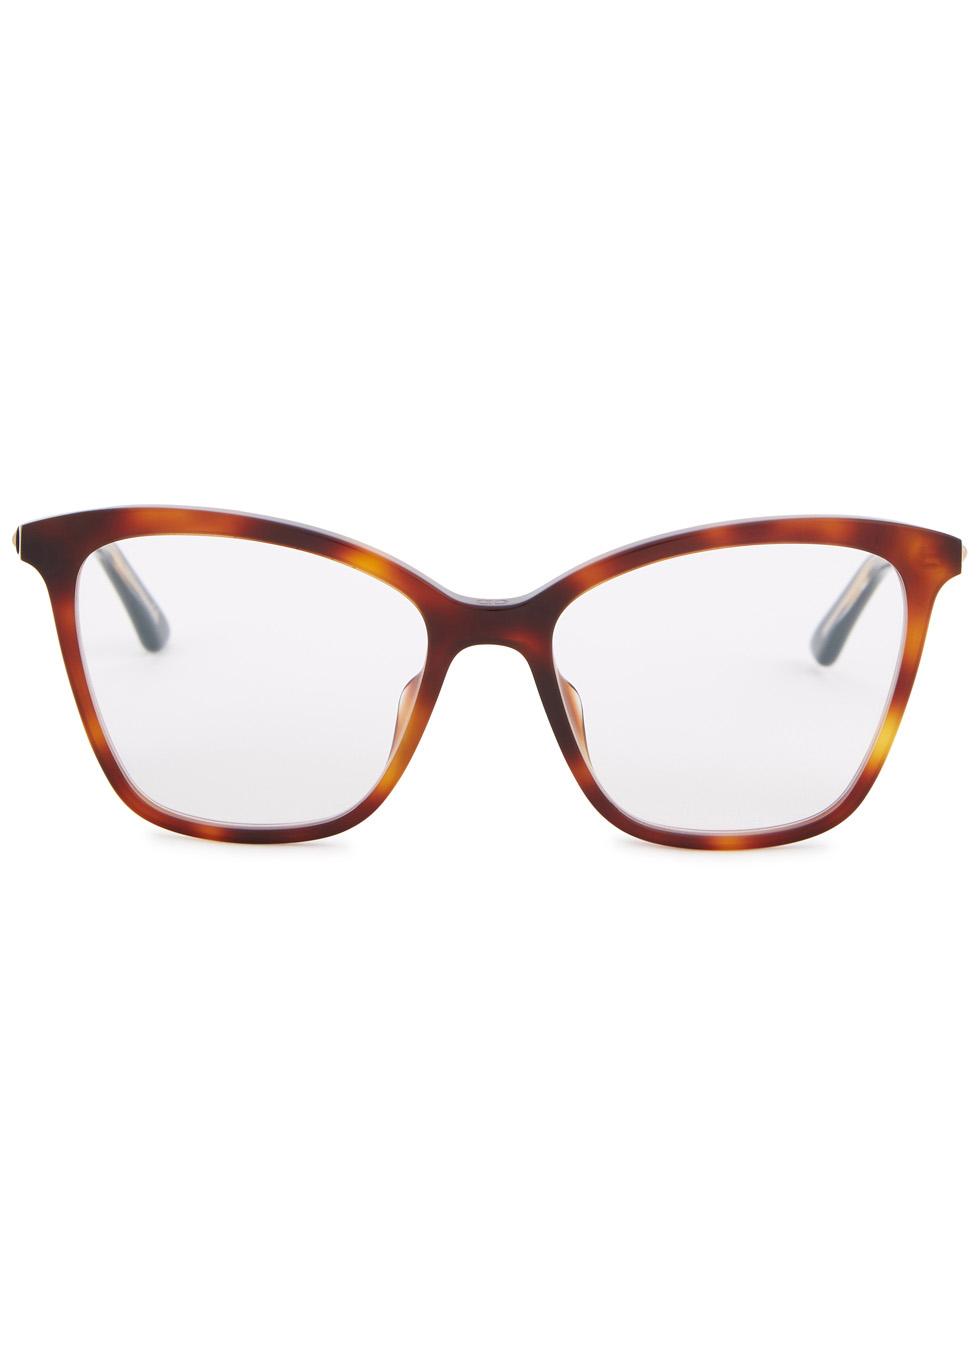 Montaigne46 cat-eye optical glasses - Dior